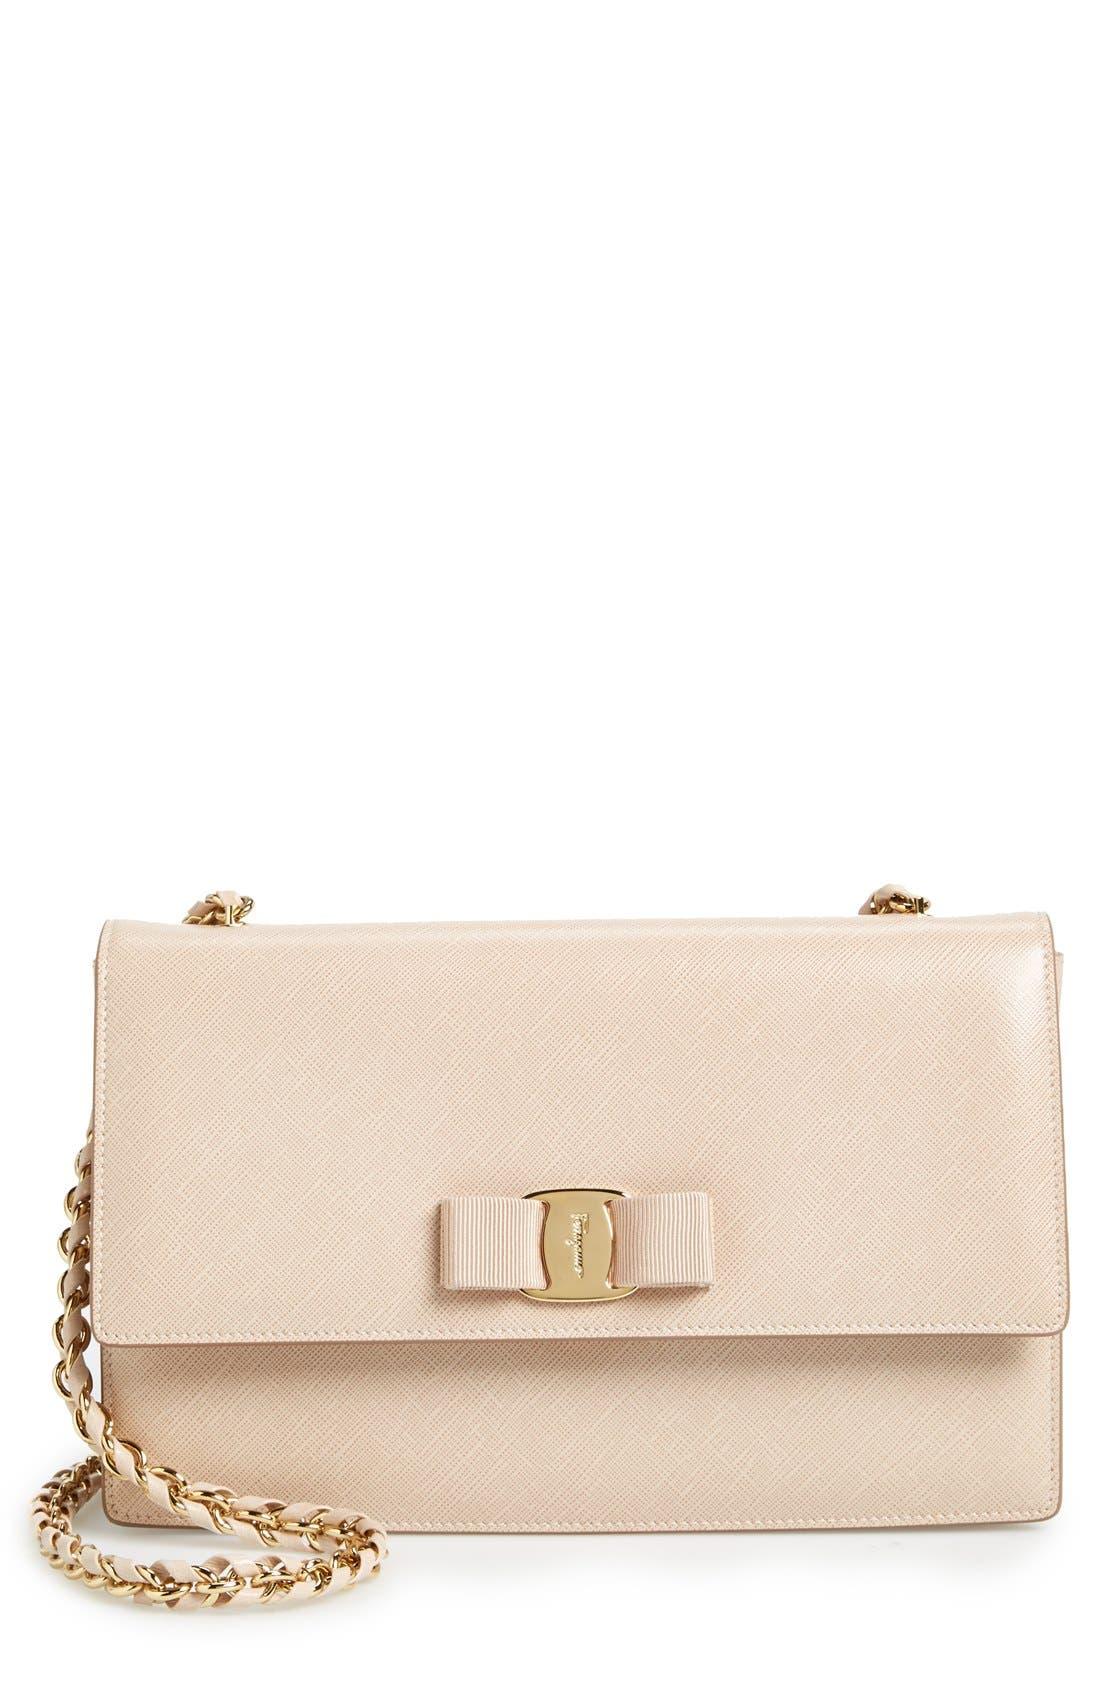 Saffiano Leather Shoulder Bag,                         Main,                         color, 250